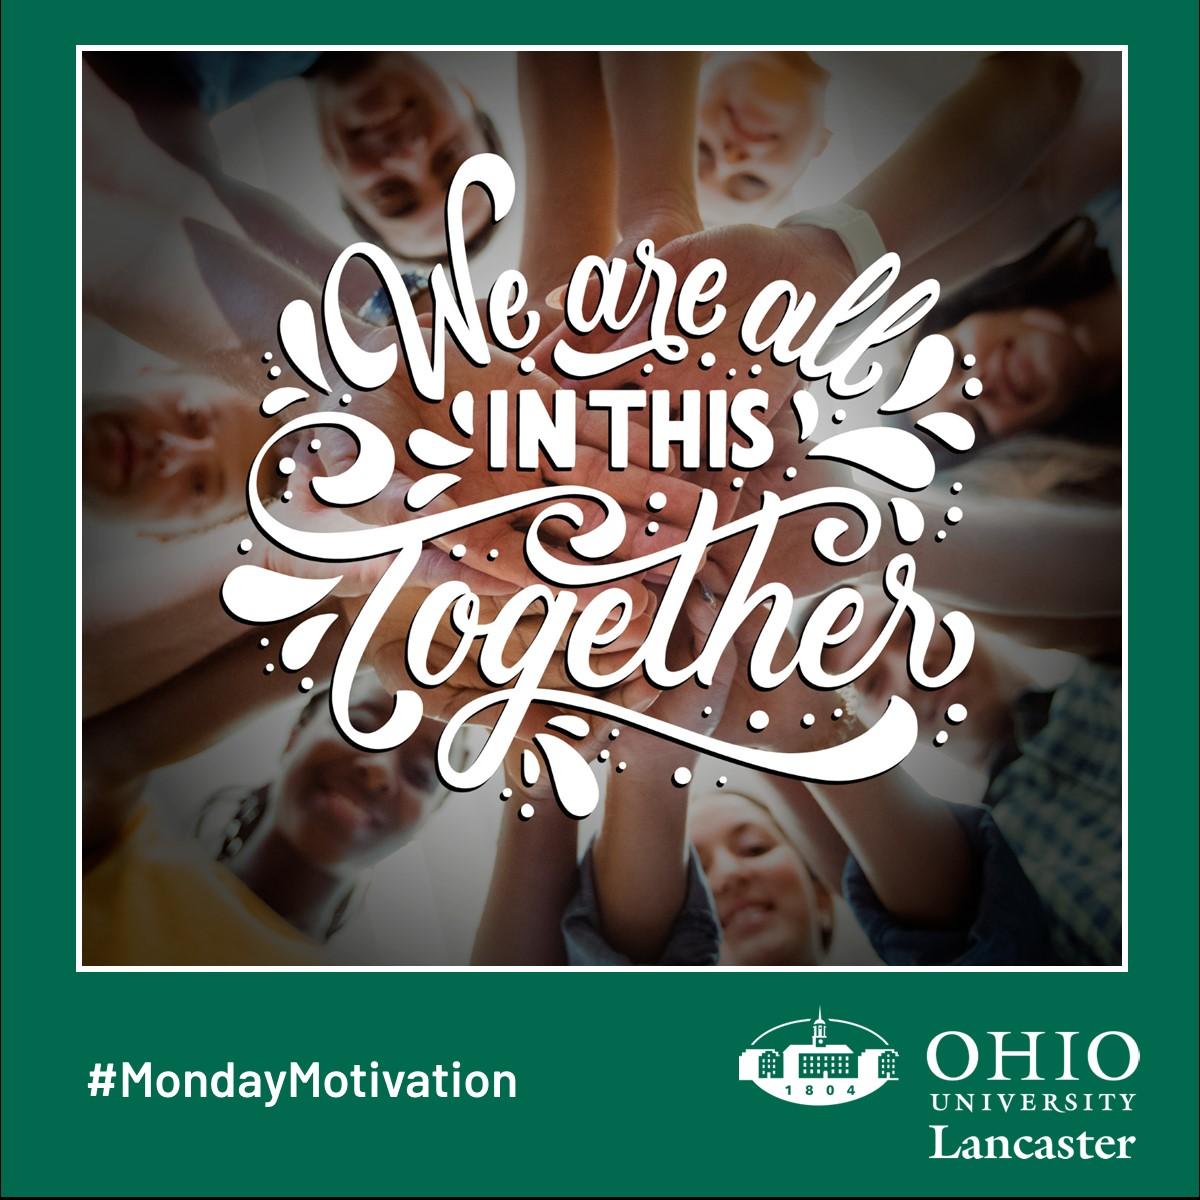 #MondayMotivation #OHIOLancaster